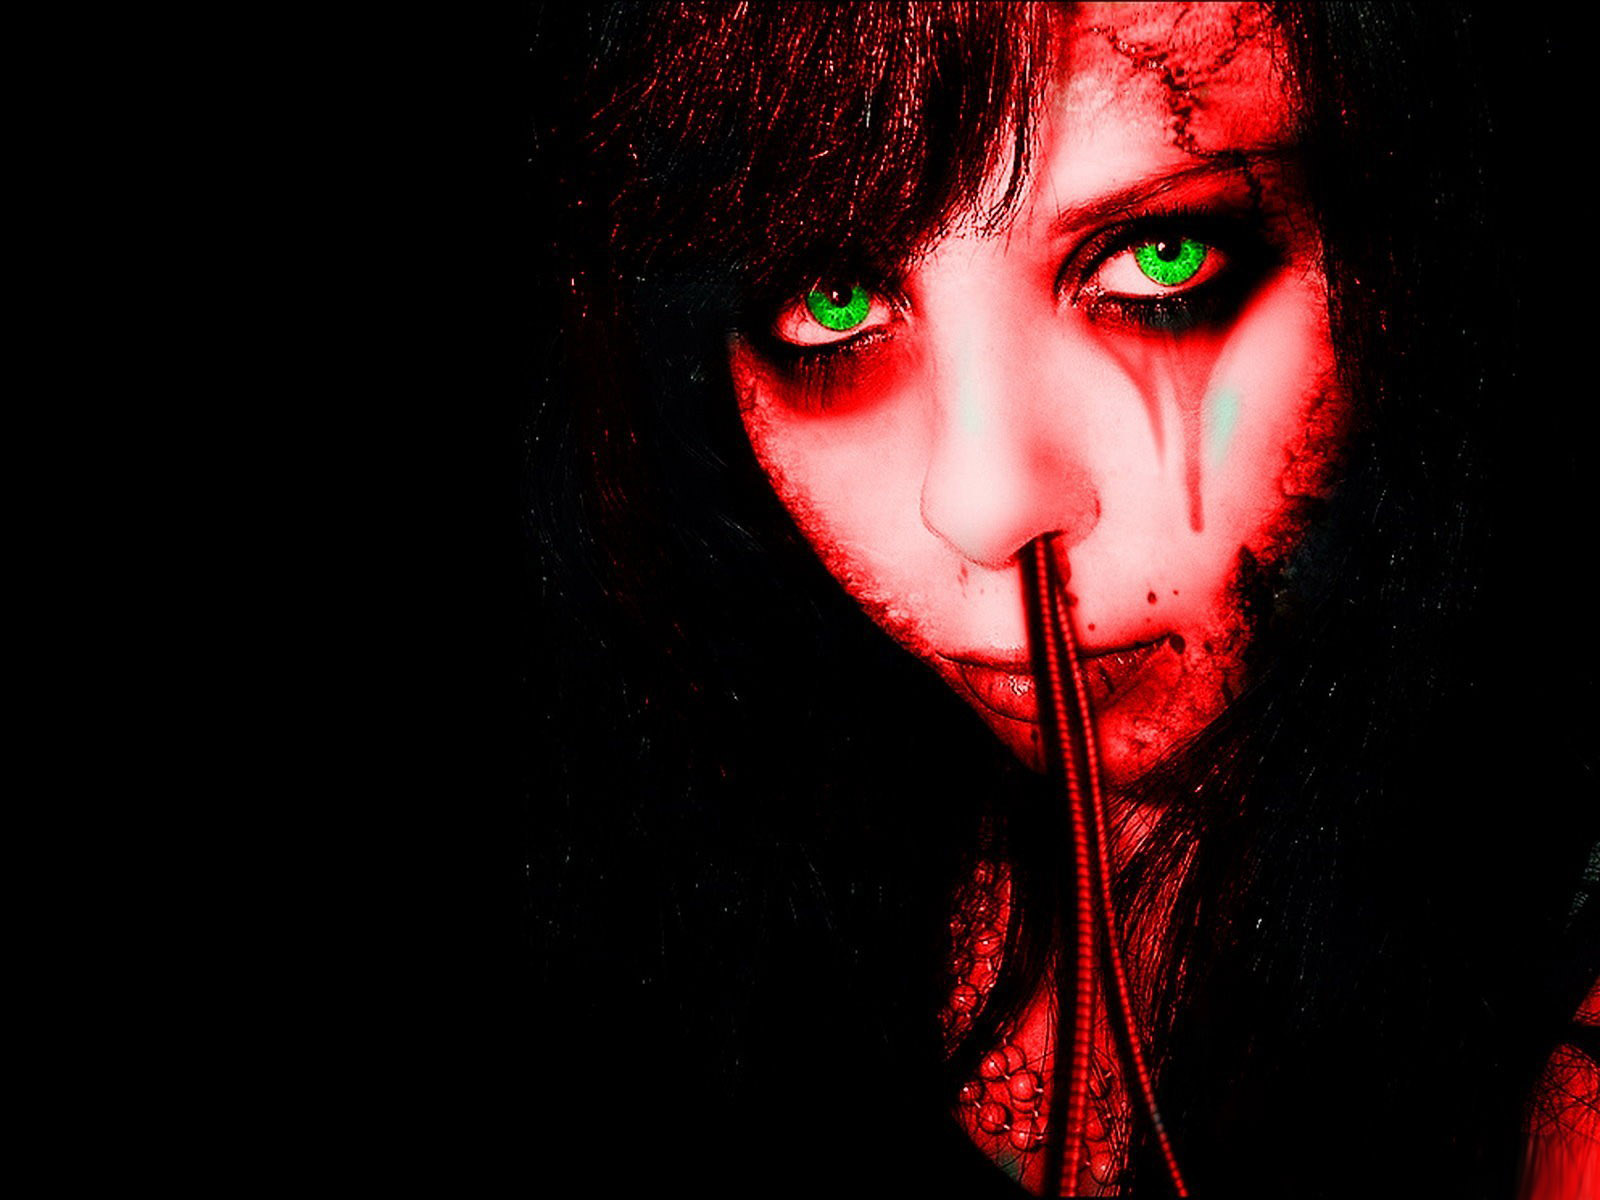 scary vampire wallpaper - photo #13